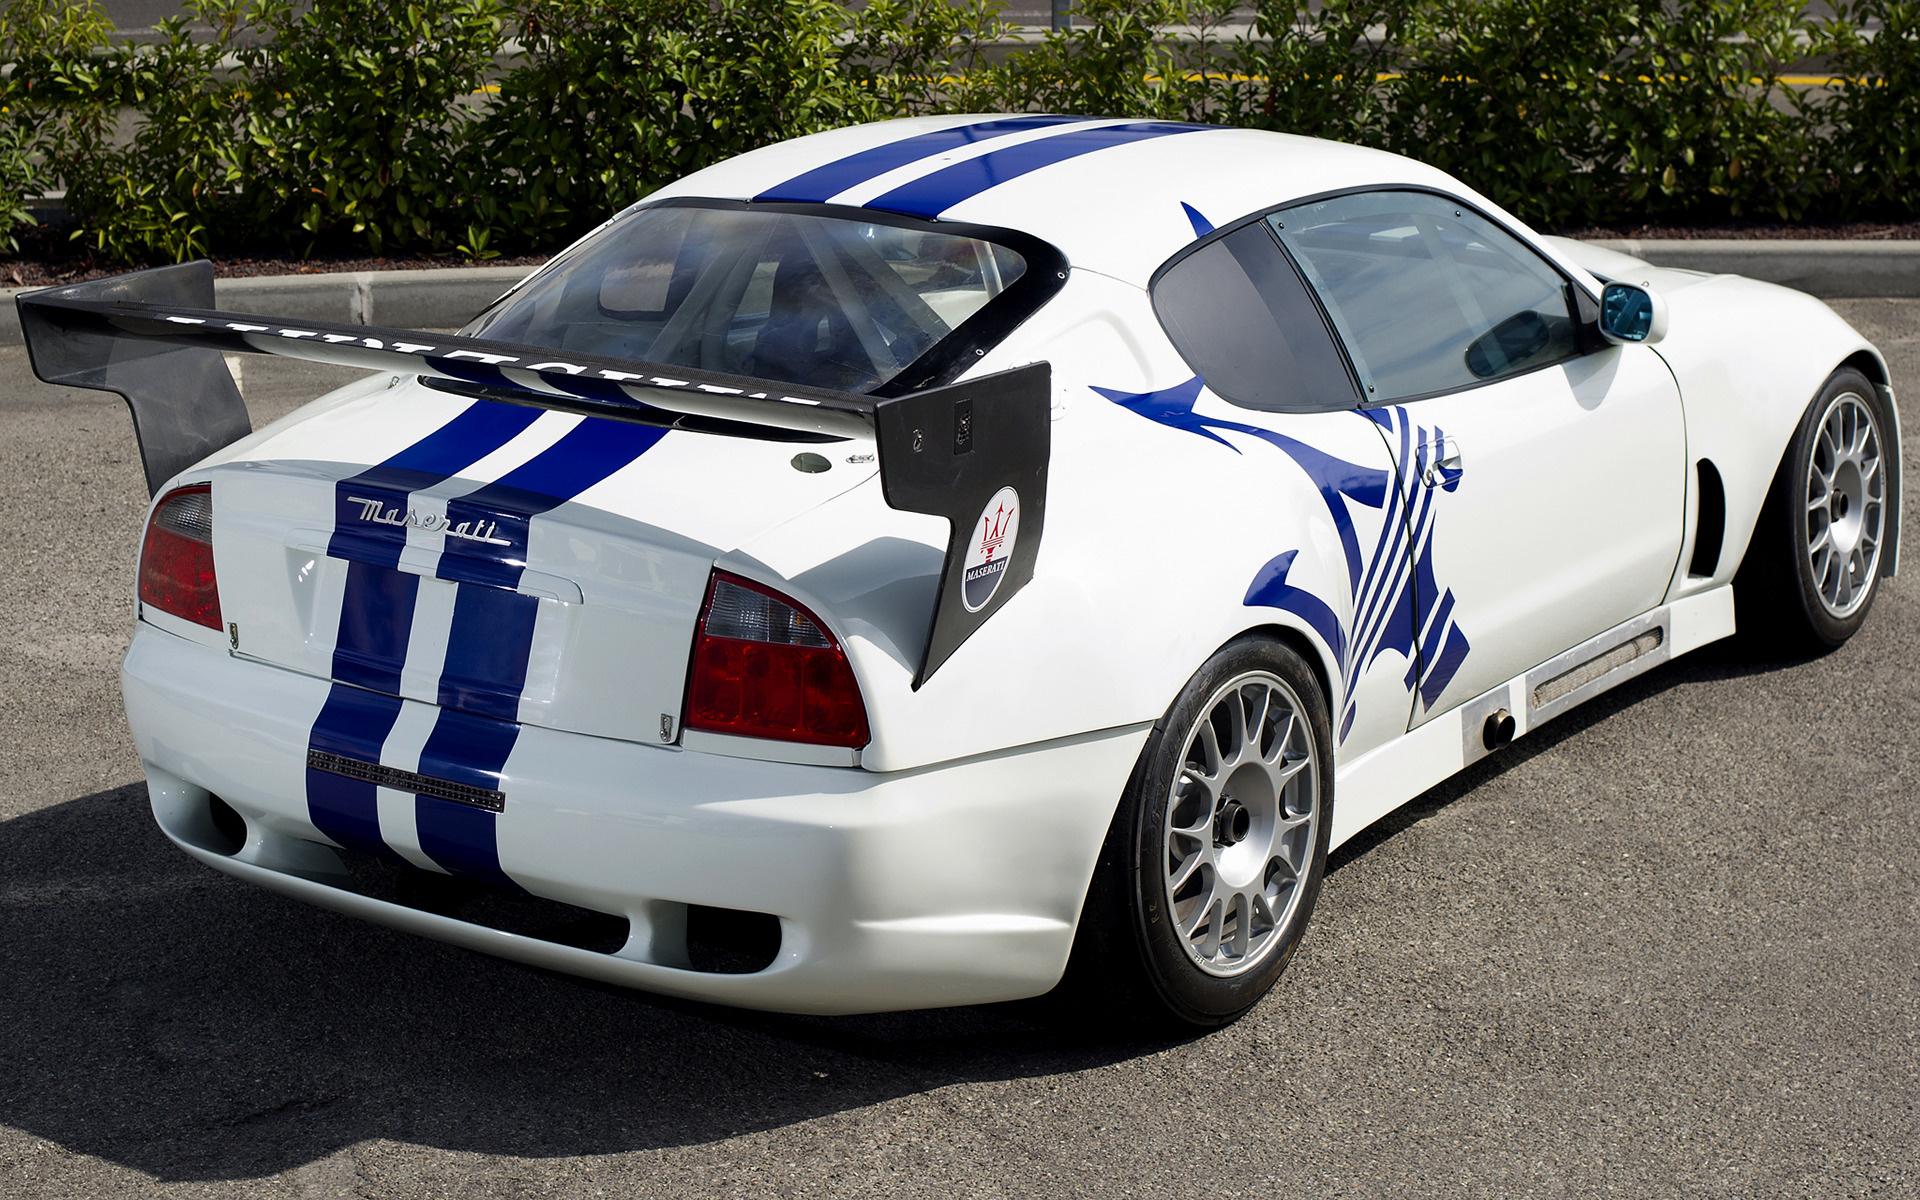 Maserati Trofeo (2003) Wallpapers and HD Images - Car Pixel